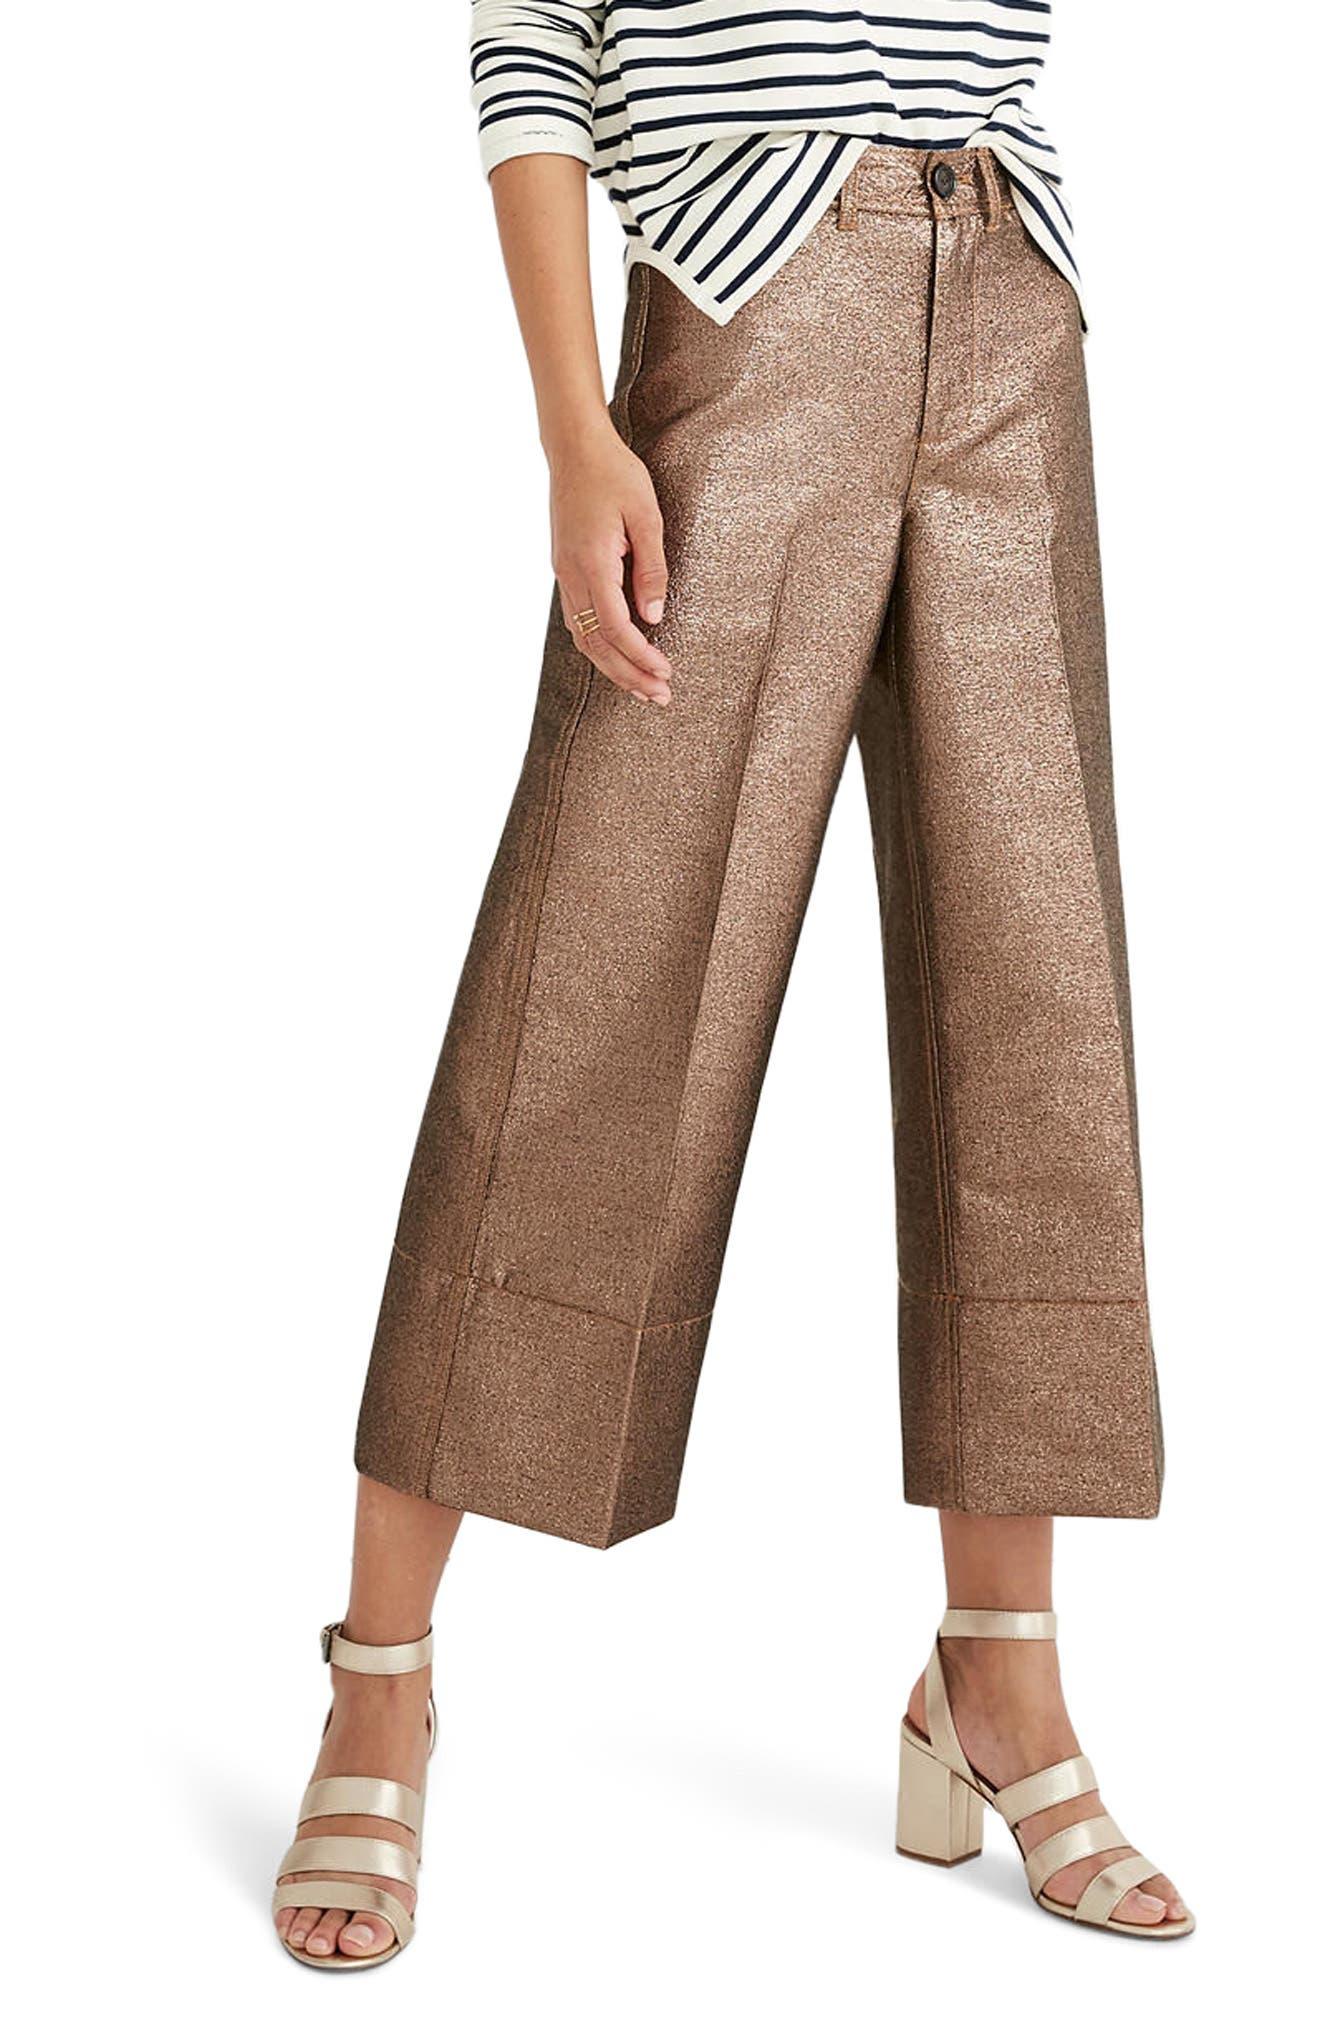 Langford Metallic Crop Wide Leg Pants,                         Main,                         color, 220